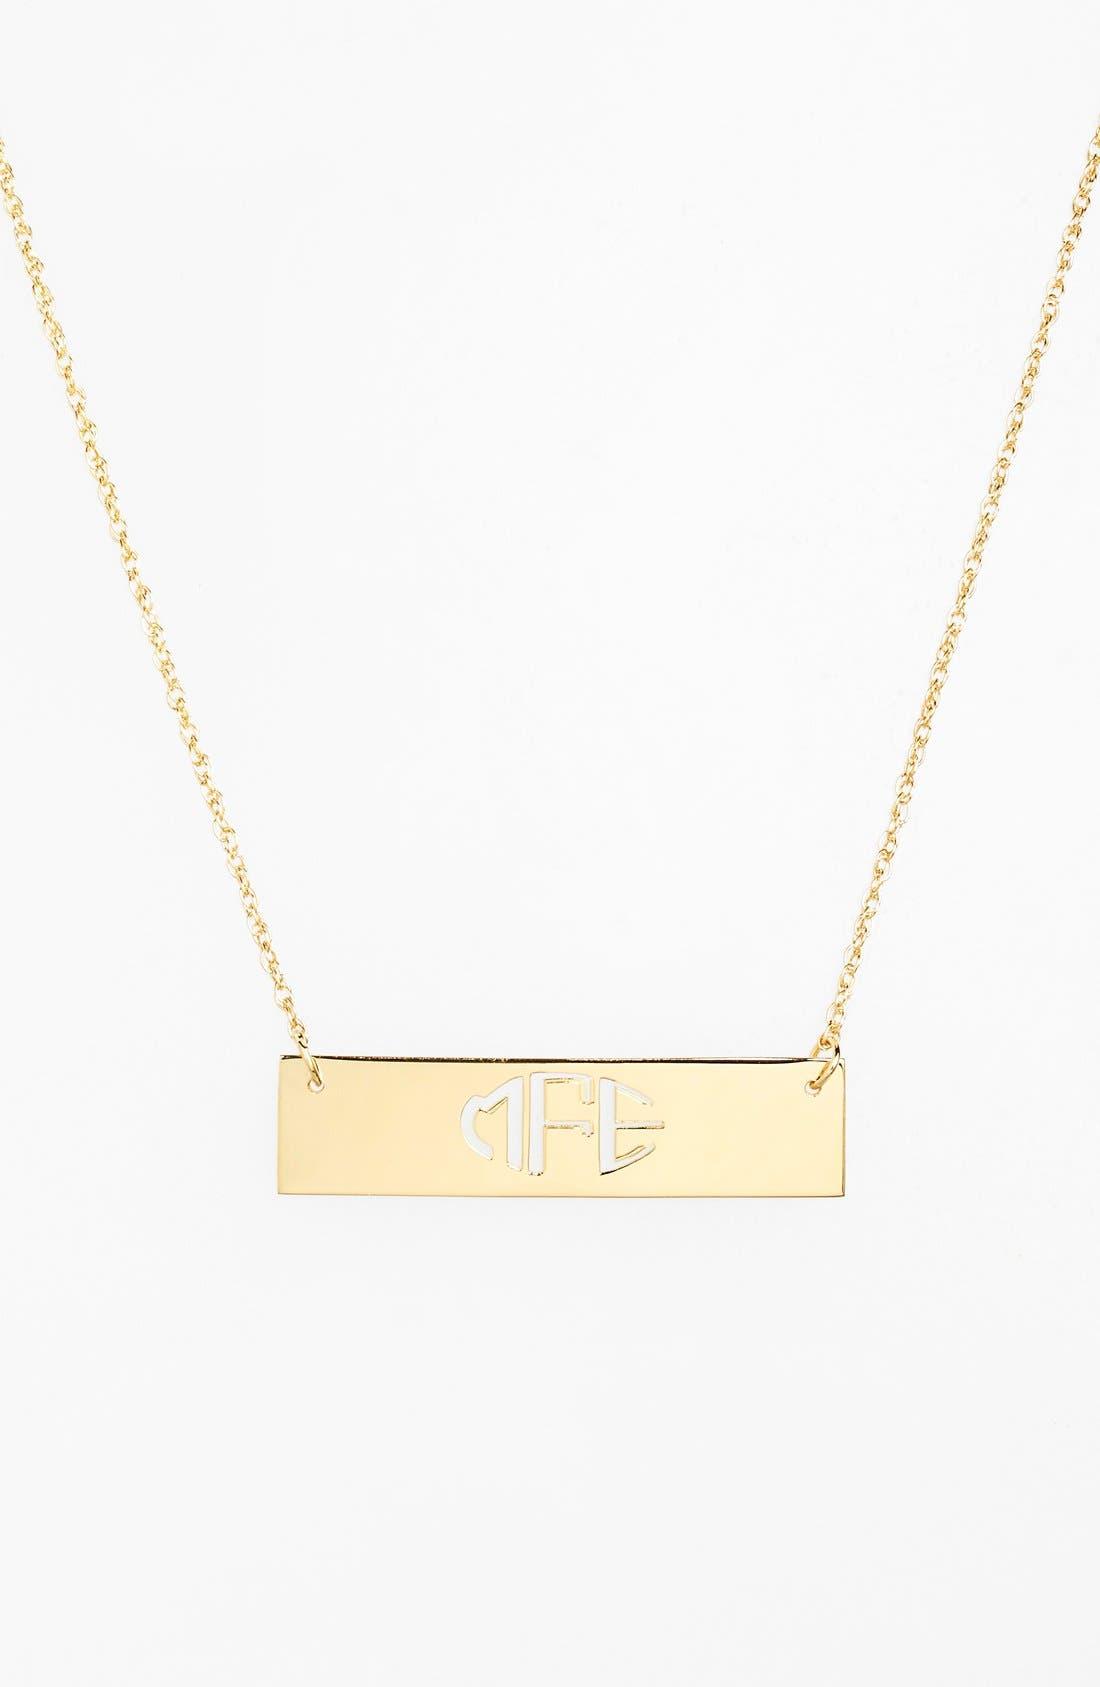 Main Image - Jane Basch Designs Personalized Cutout Bar Pendant Necklace